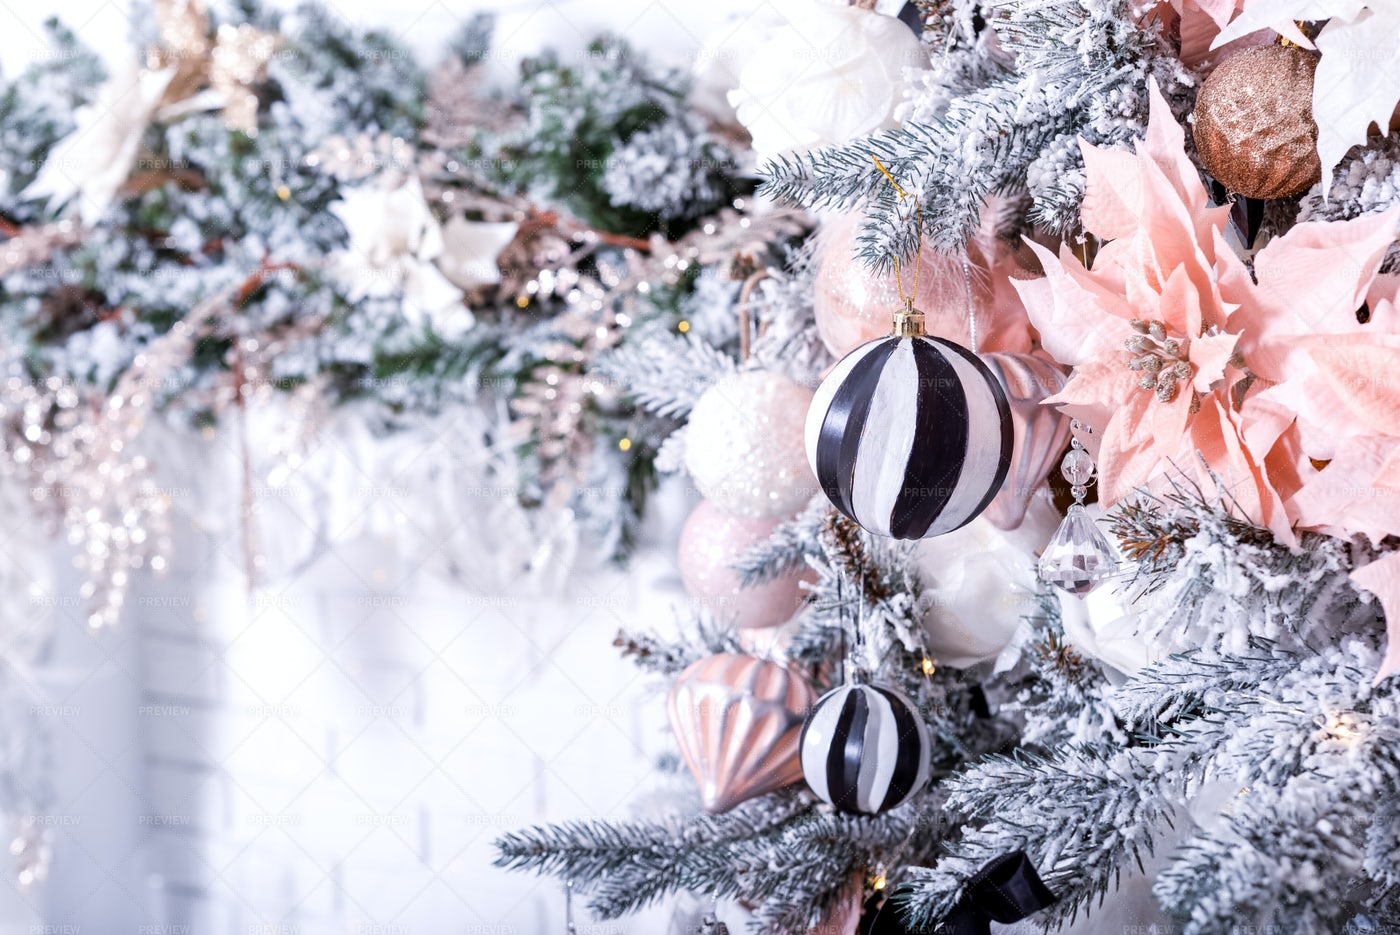 Bright Festive Christmas Wallpaper: Stock Photos